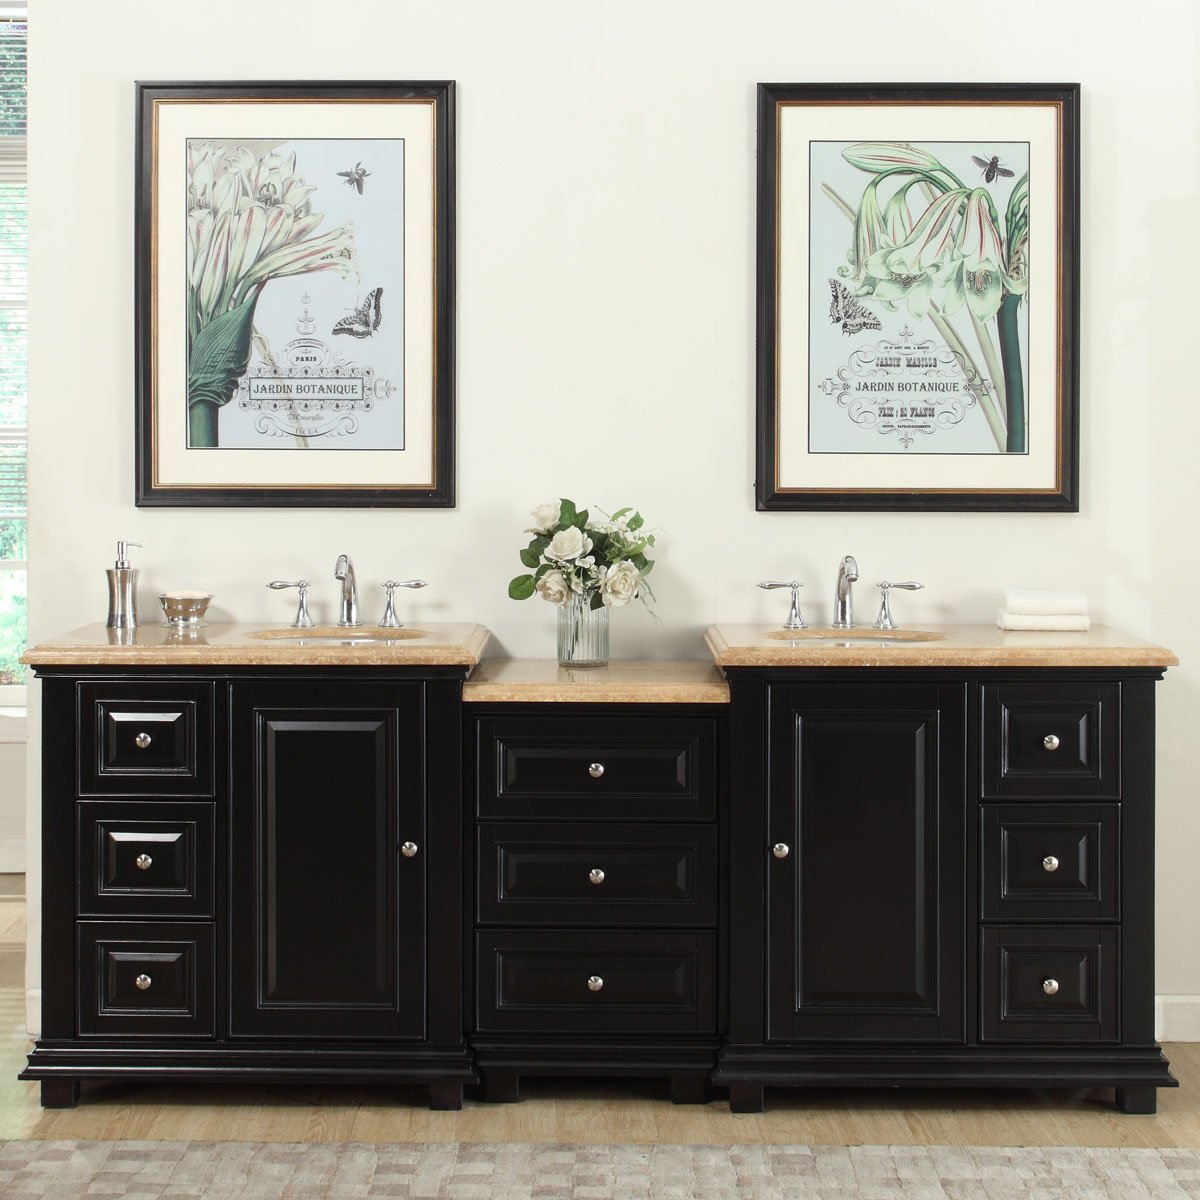 Silkroad Exclusive Bathroom Vanity Travertine Top Double Sink Cabinet, 90.5'' by Silkroad Exclusive